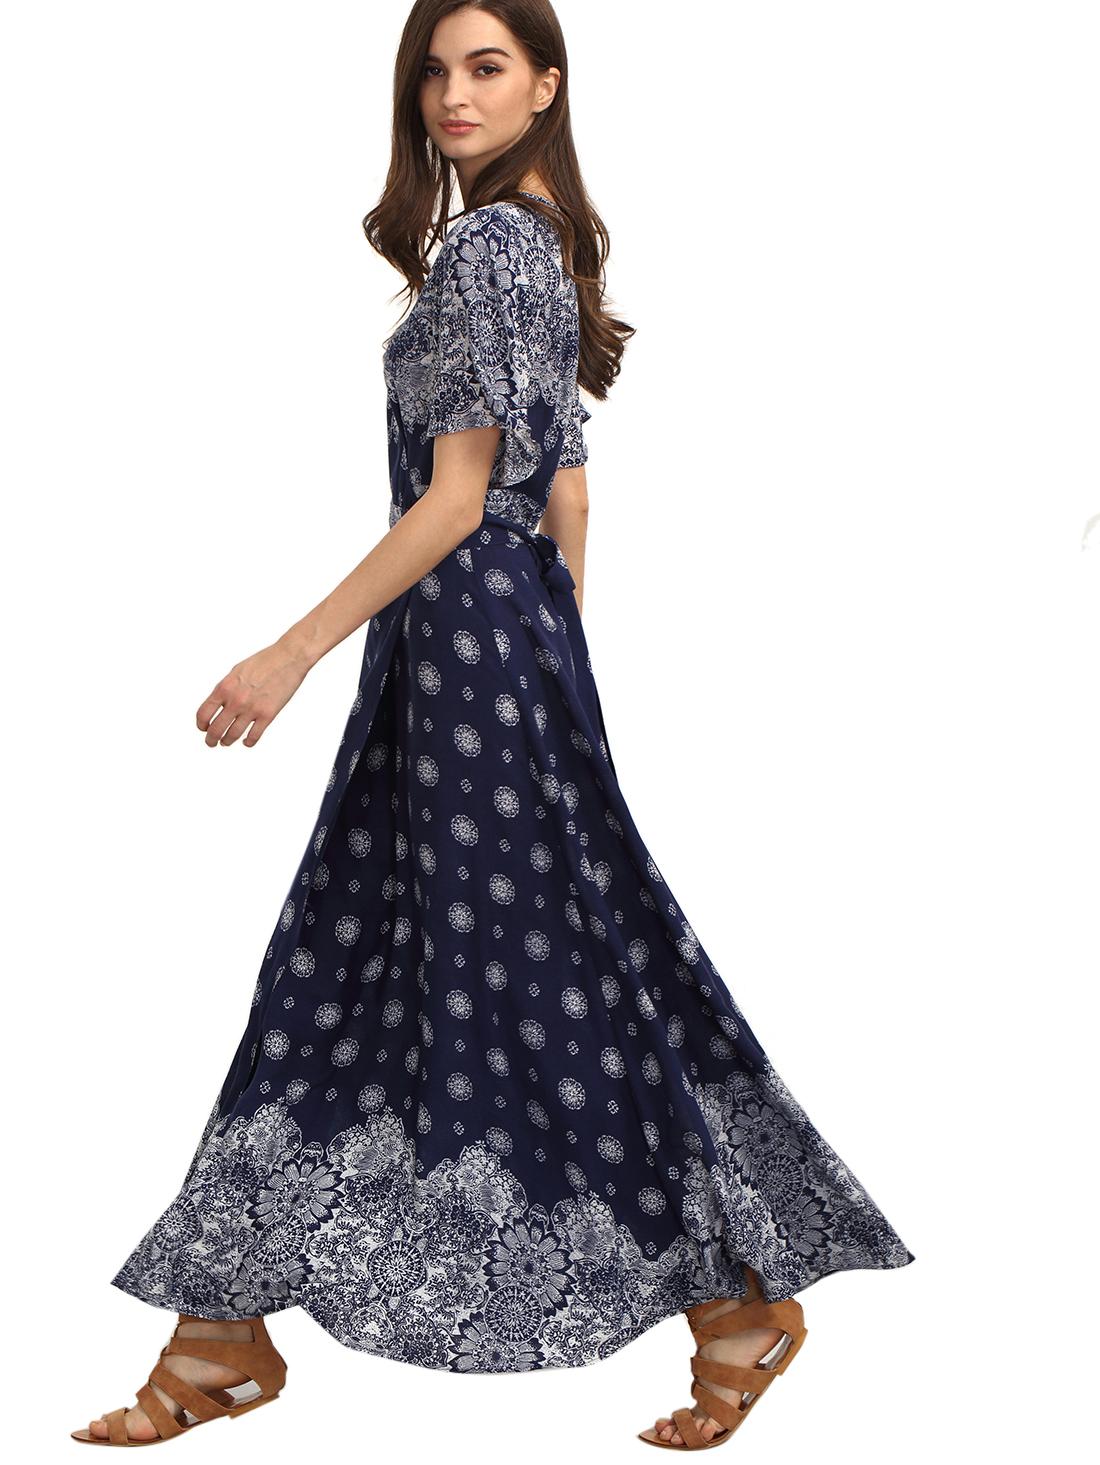 c562f295cd4b casual wear, beach, boho clothing, maxi. Find it at https://www.amazon.com/ Floerns-Womens-Bohemian-Sleeve-Vintage/dp/B01HO4LUTY/ref